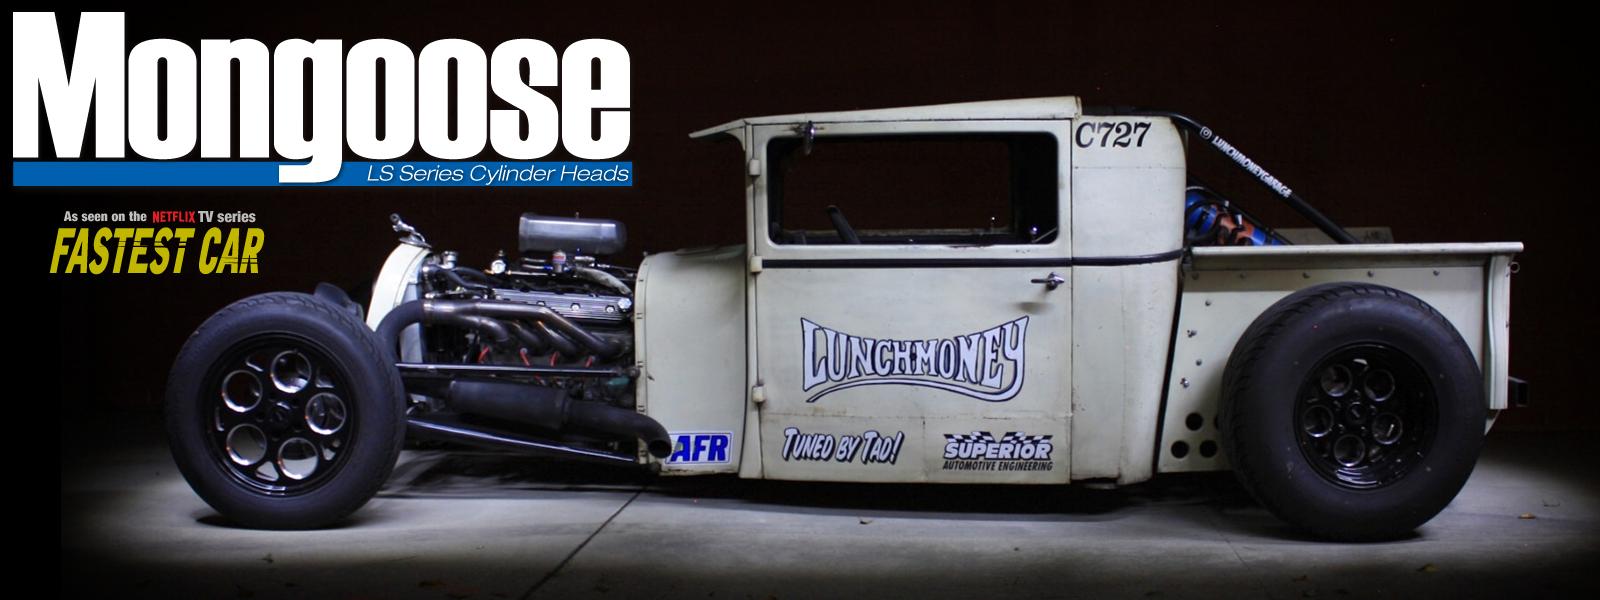 LSX - Mongoose High Performance Cylinder Heads